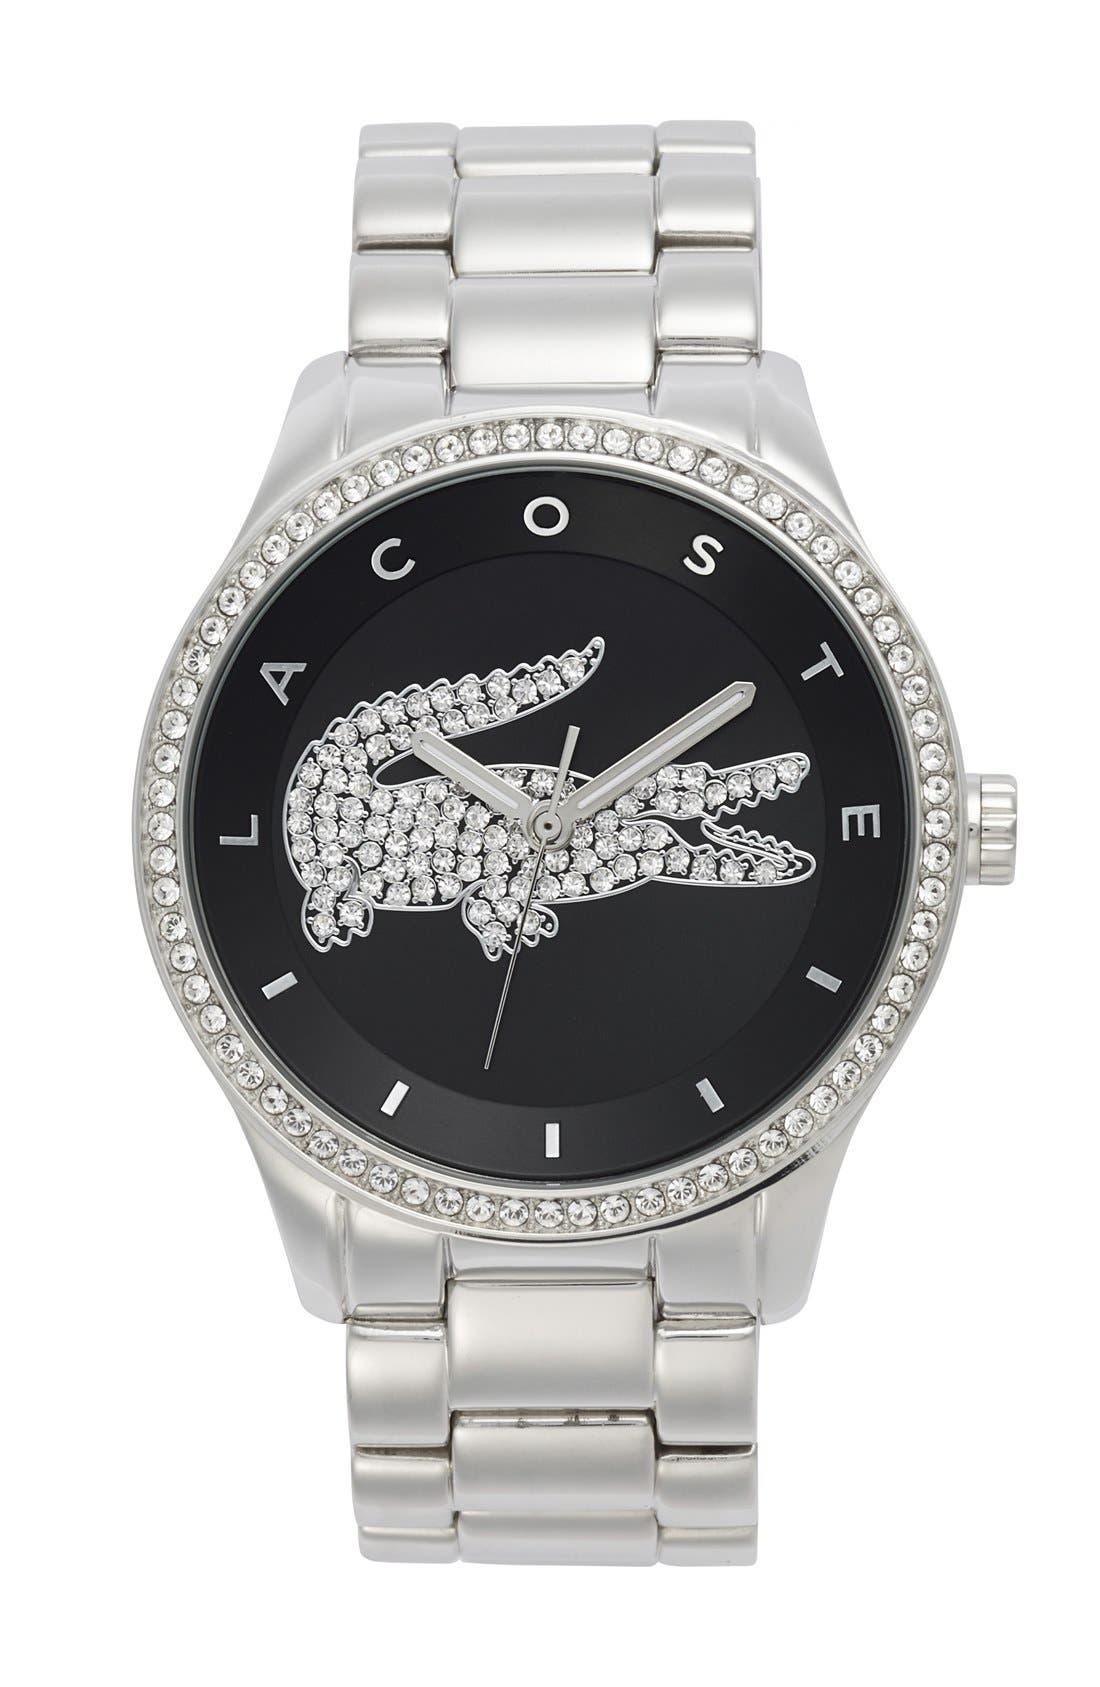 Main Image - Lacoste 'Victoria' Crystal Bezel Logo Bracelet Watch, 40mm